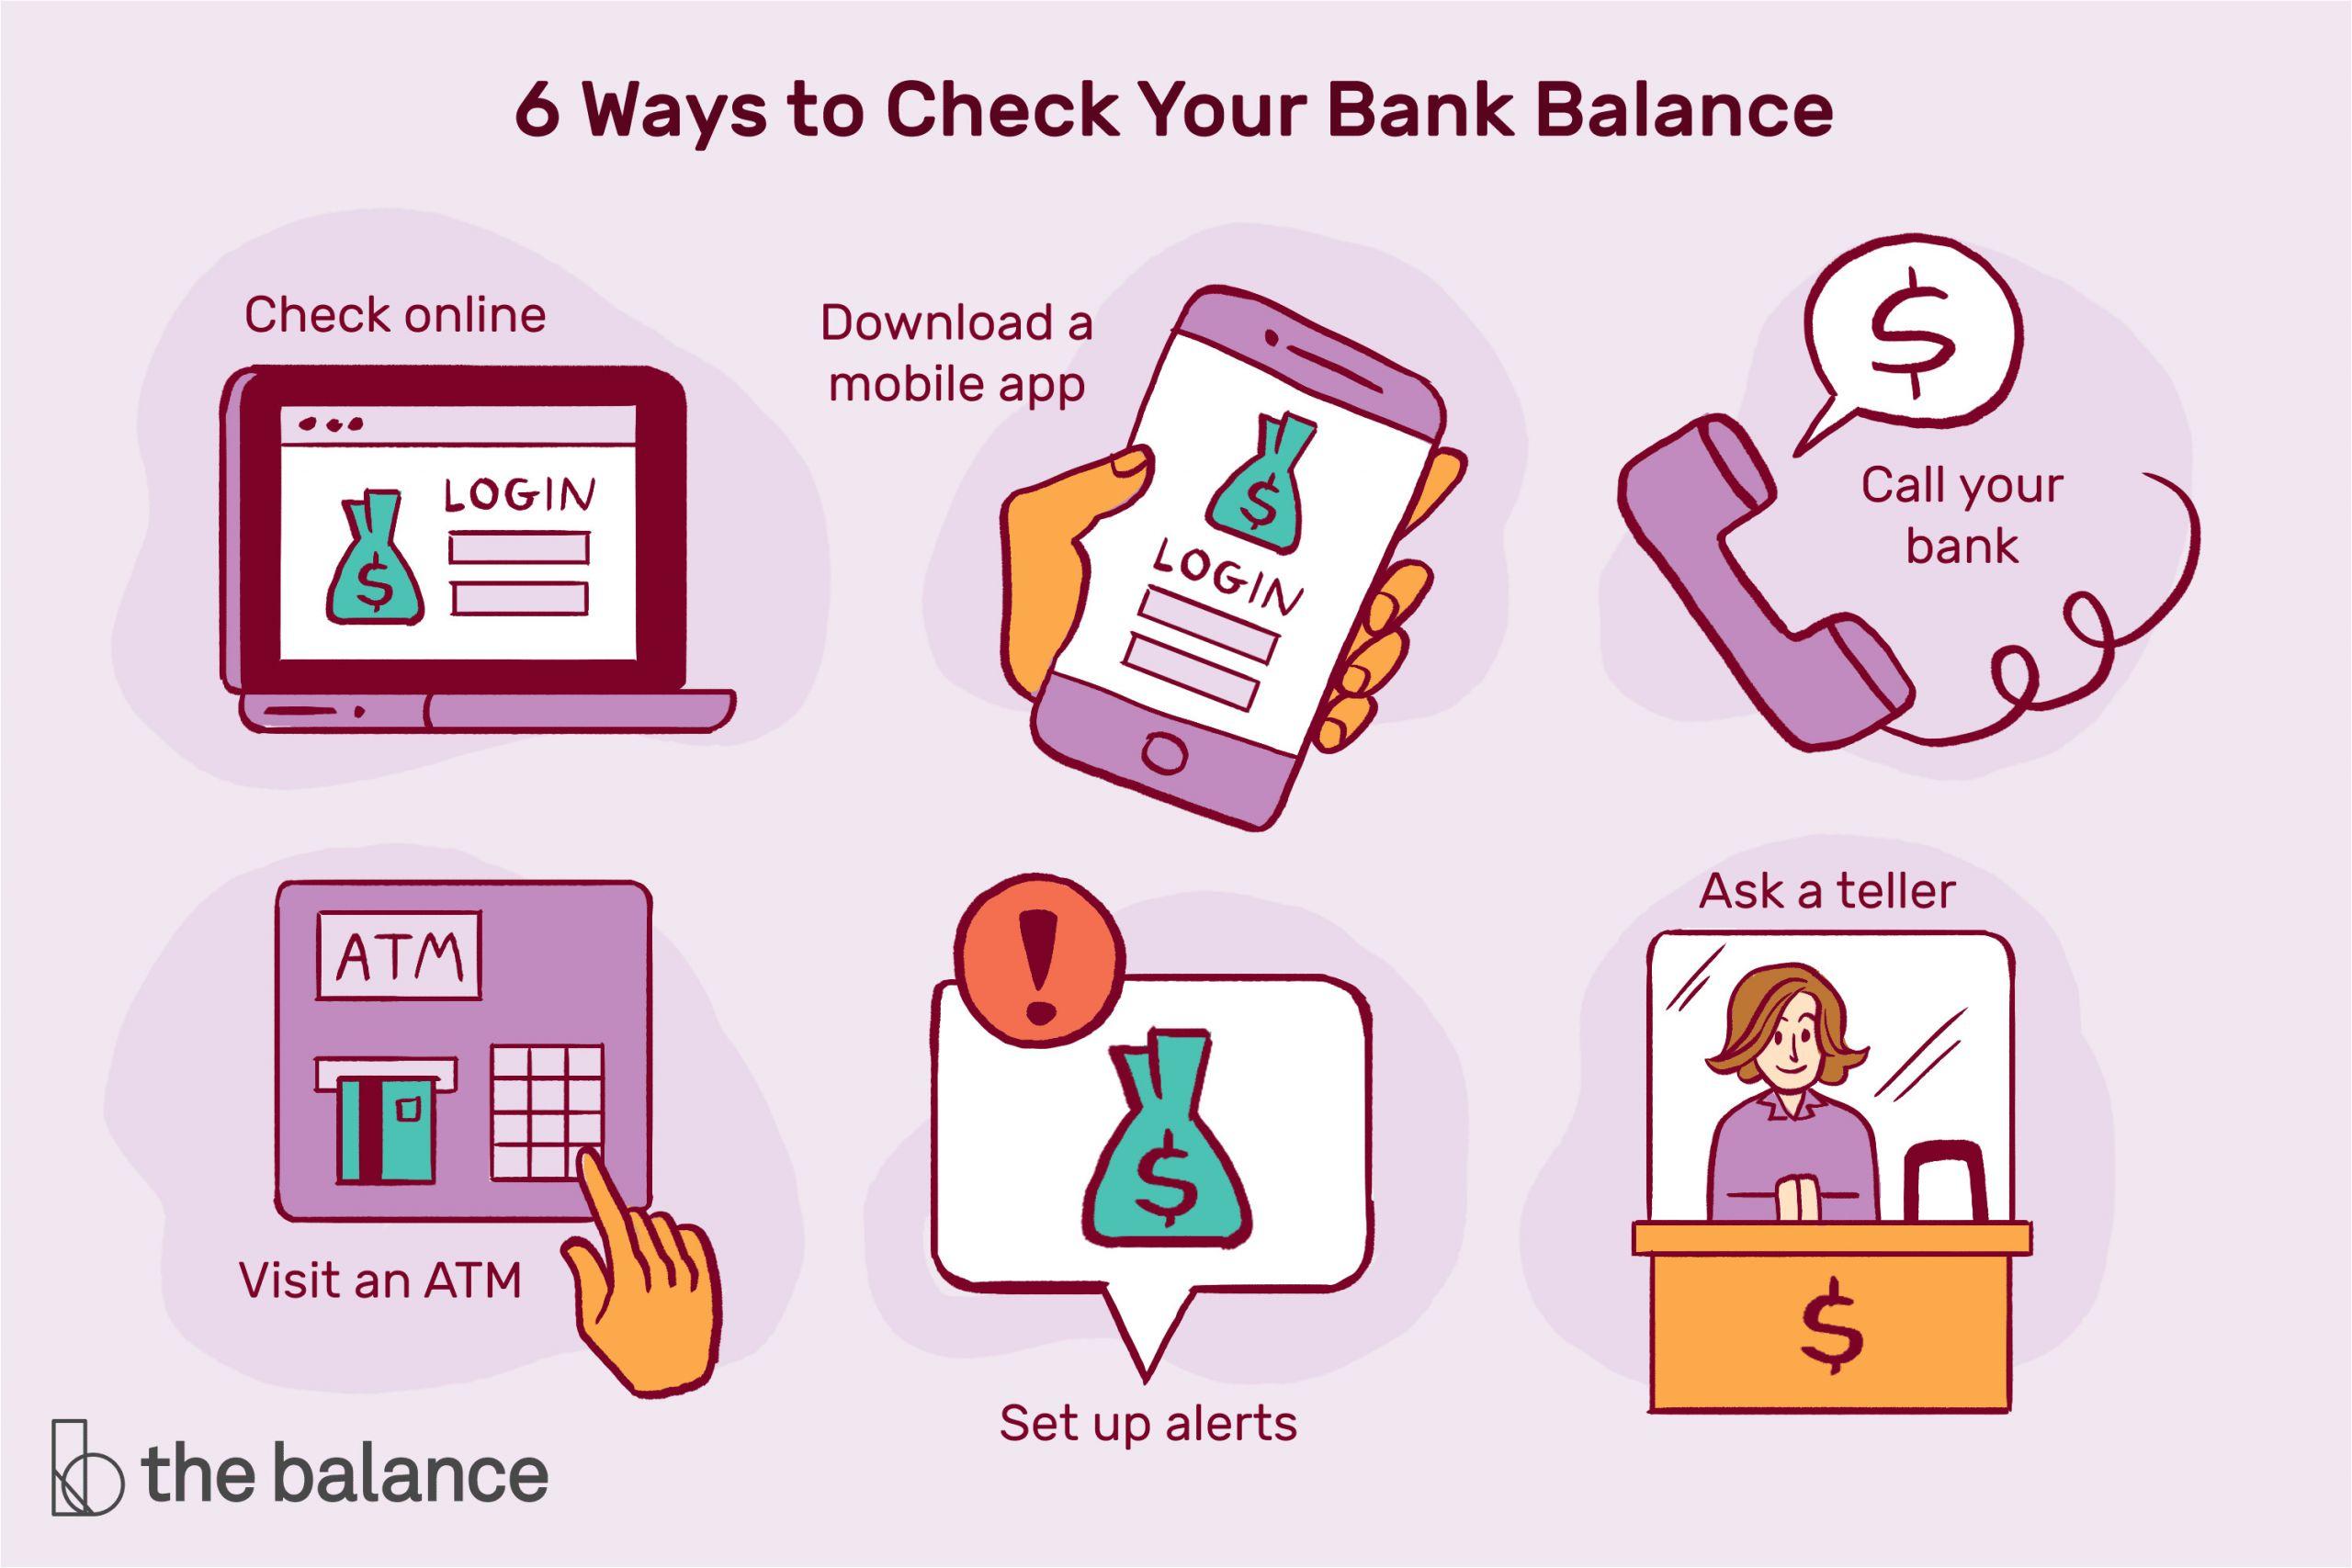 check your bank balance online 315469 final 65f751f553e34e7cb1852e957d917745 png